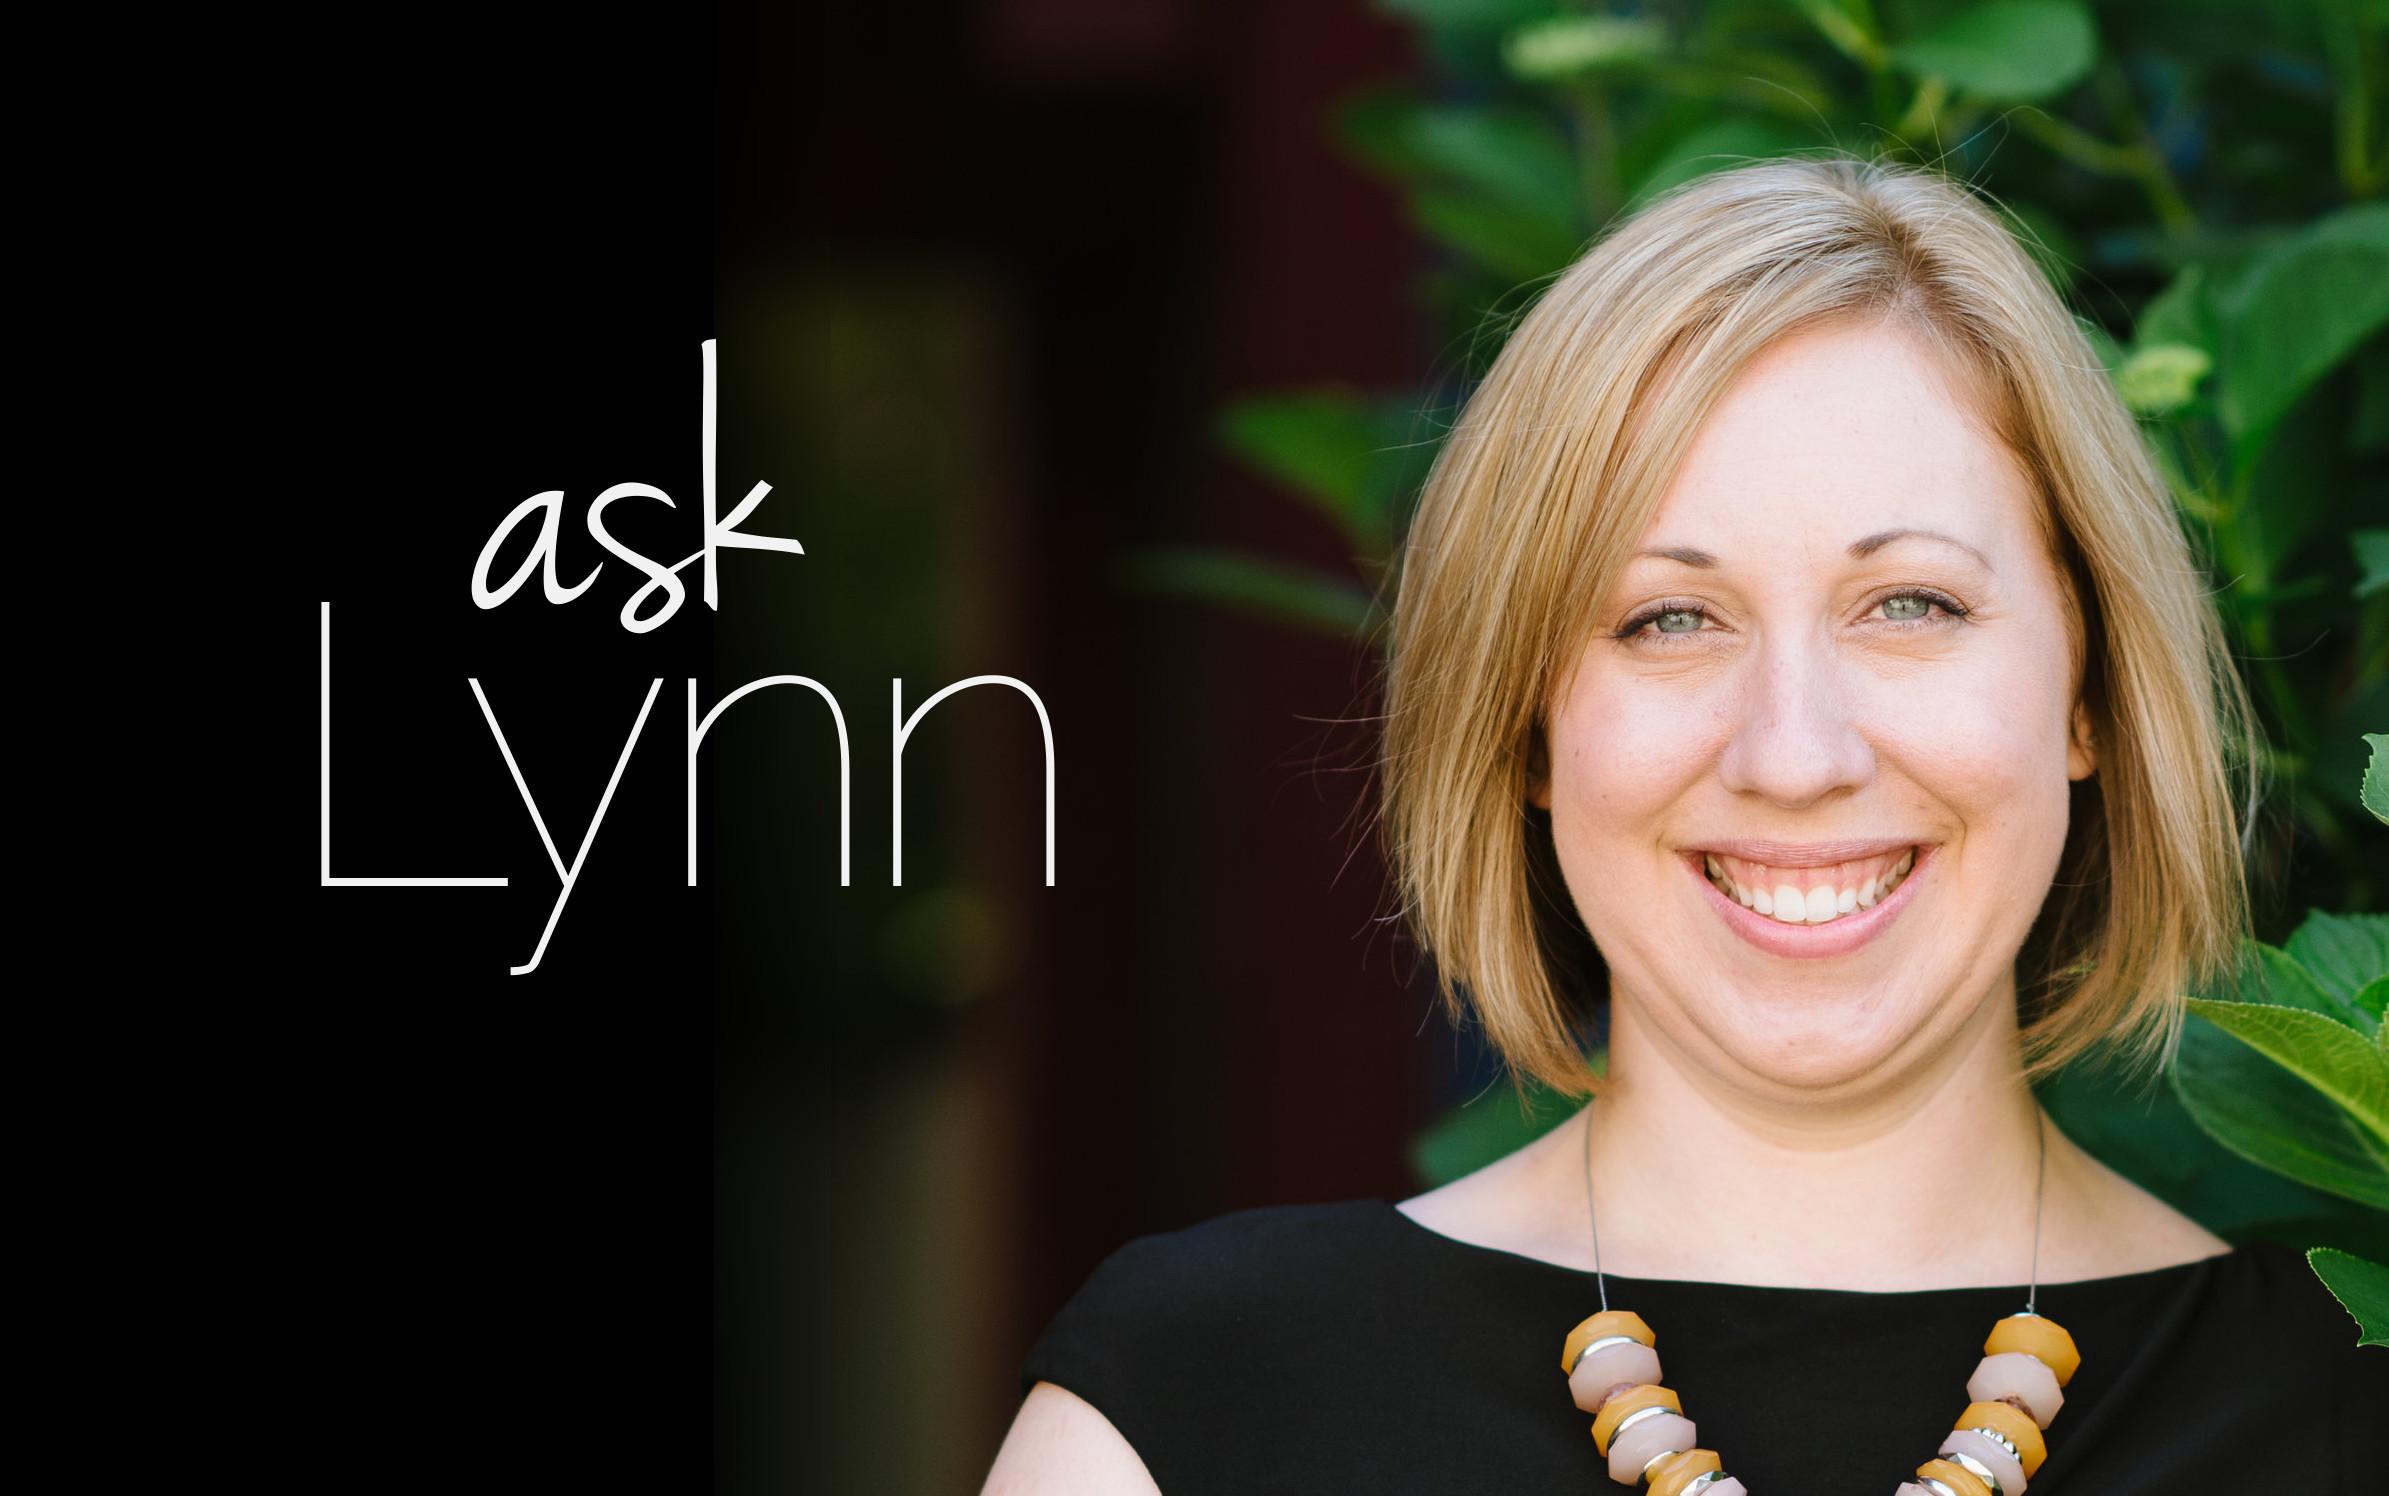 Ask Lynn, a virtual advice column